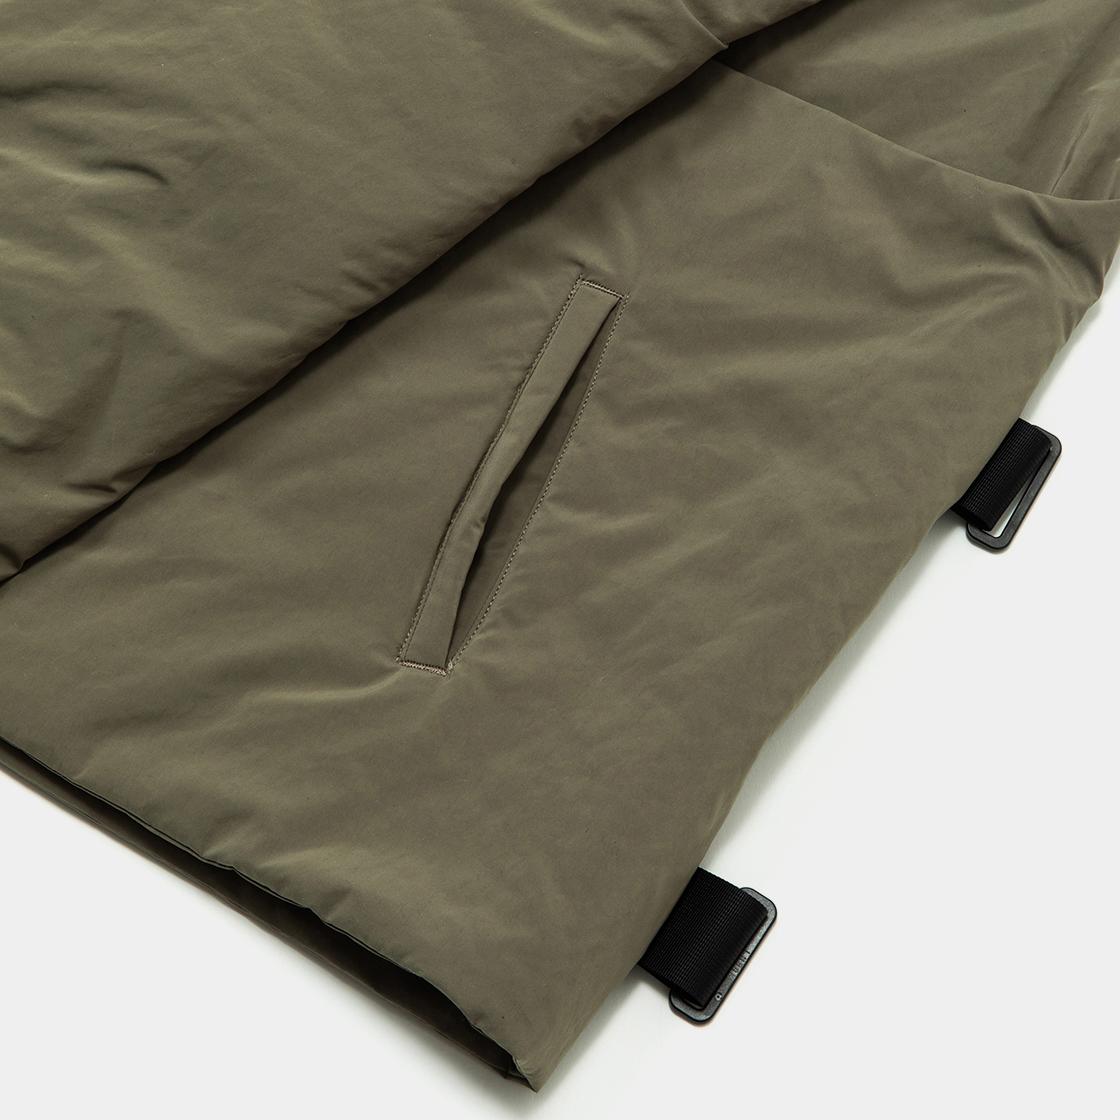 Padding Body Armor Vest / Khaki